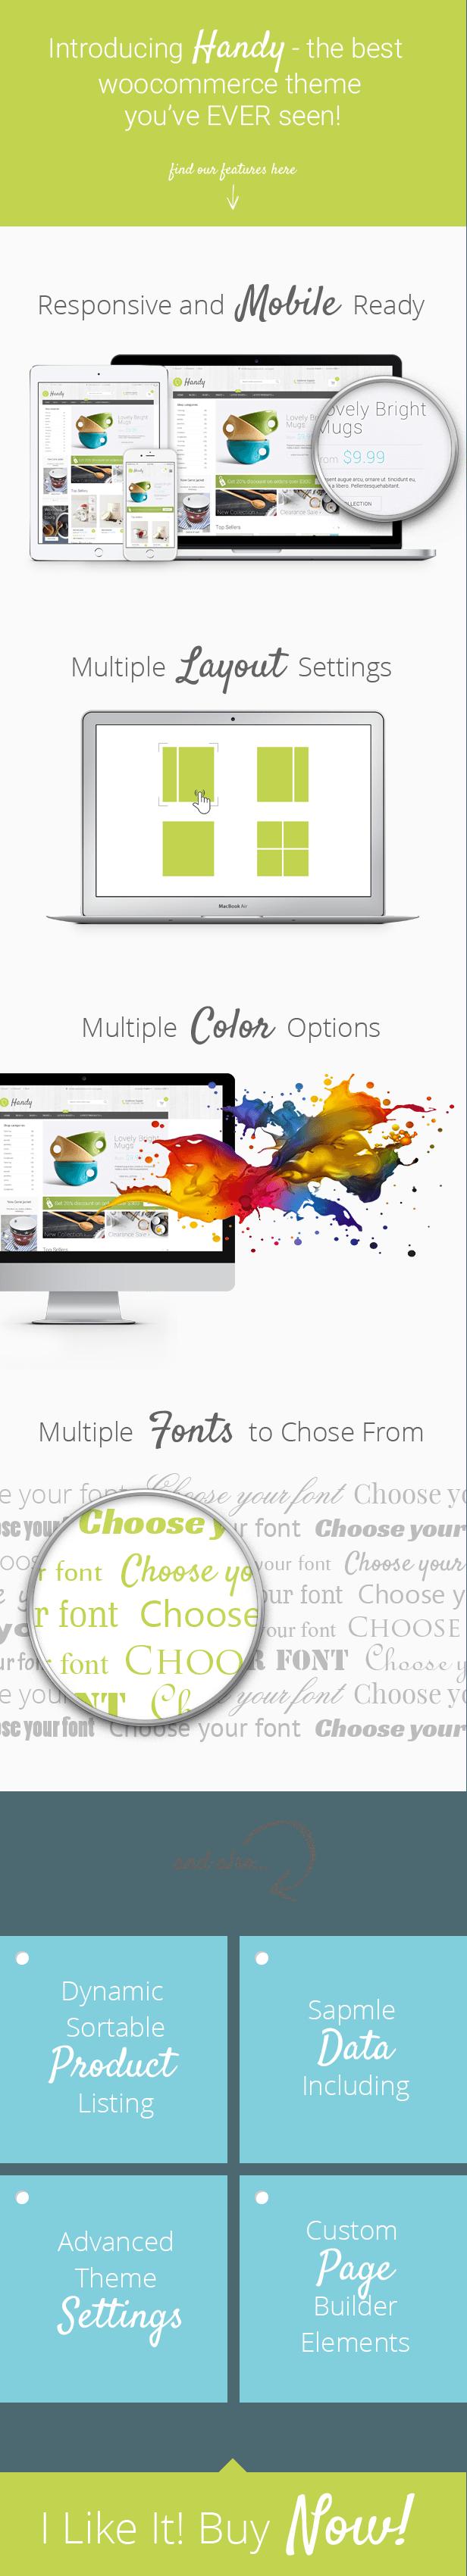 handy pres - Handy - Handmade Shop WordPress WooCommerce Theme